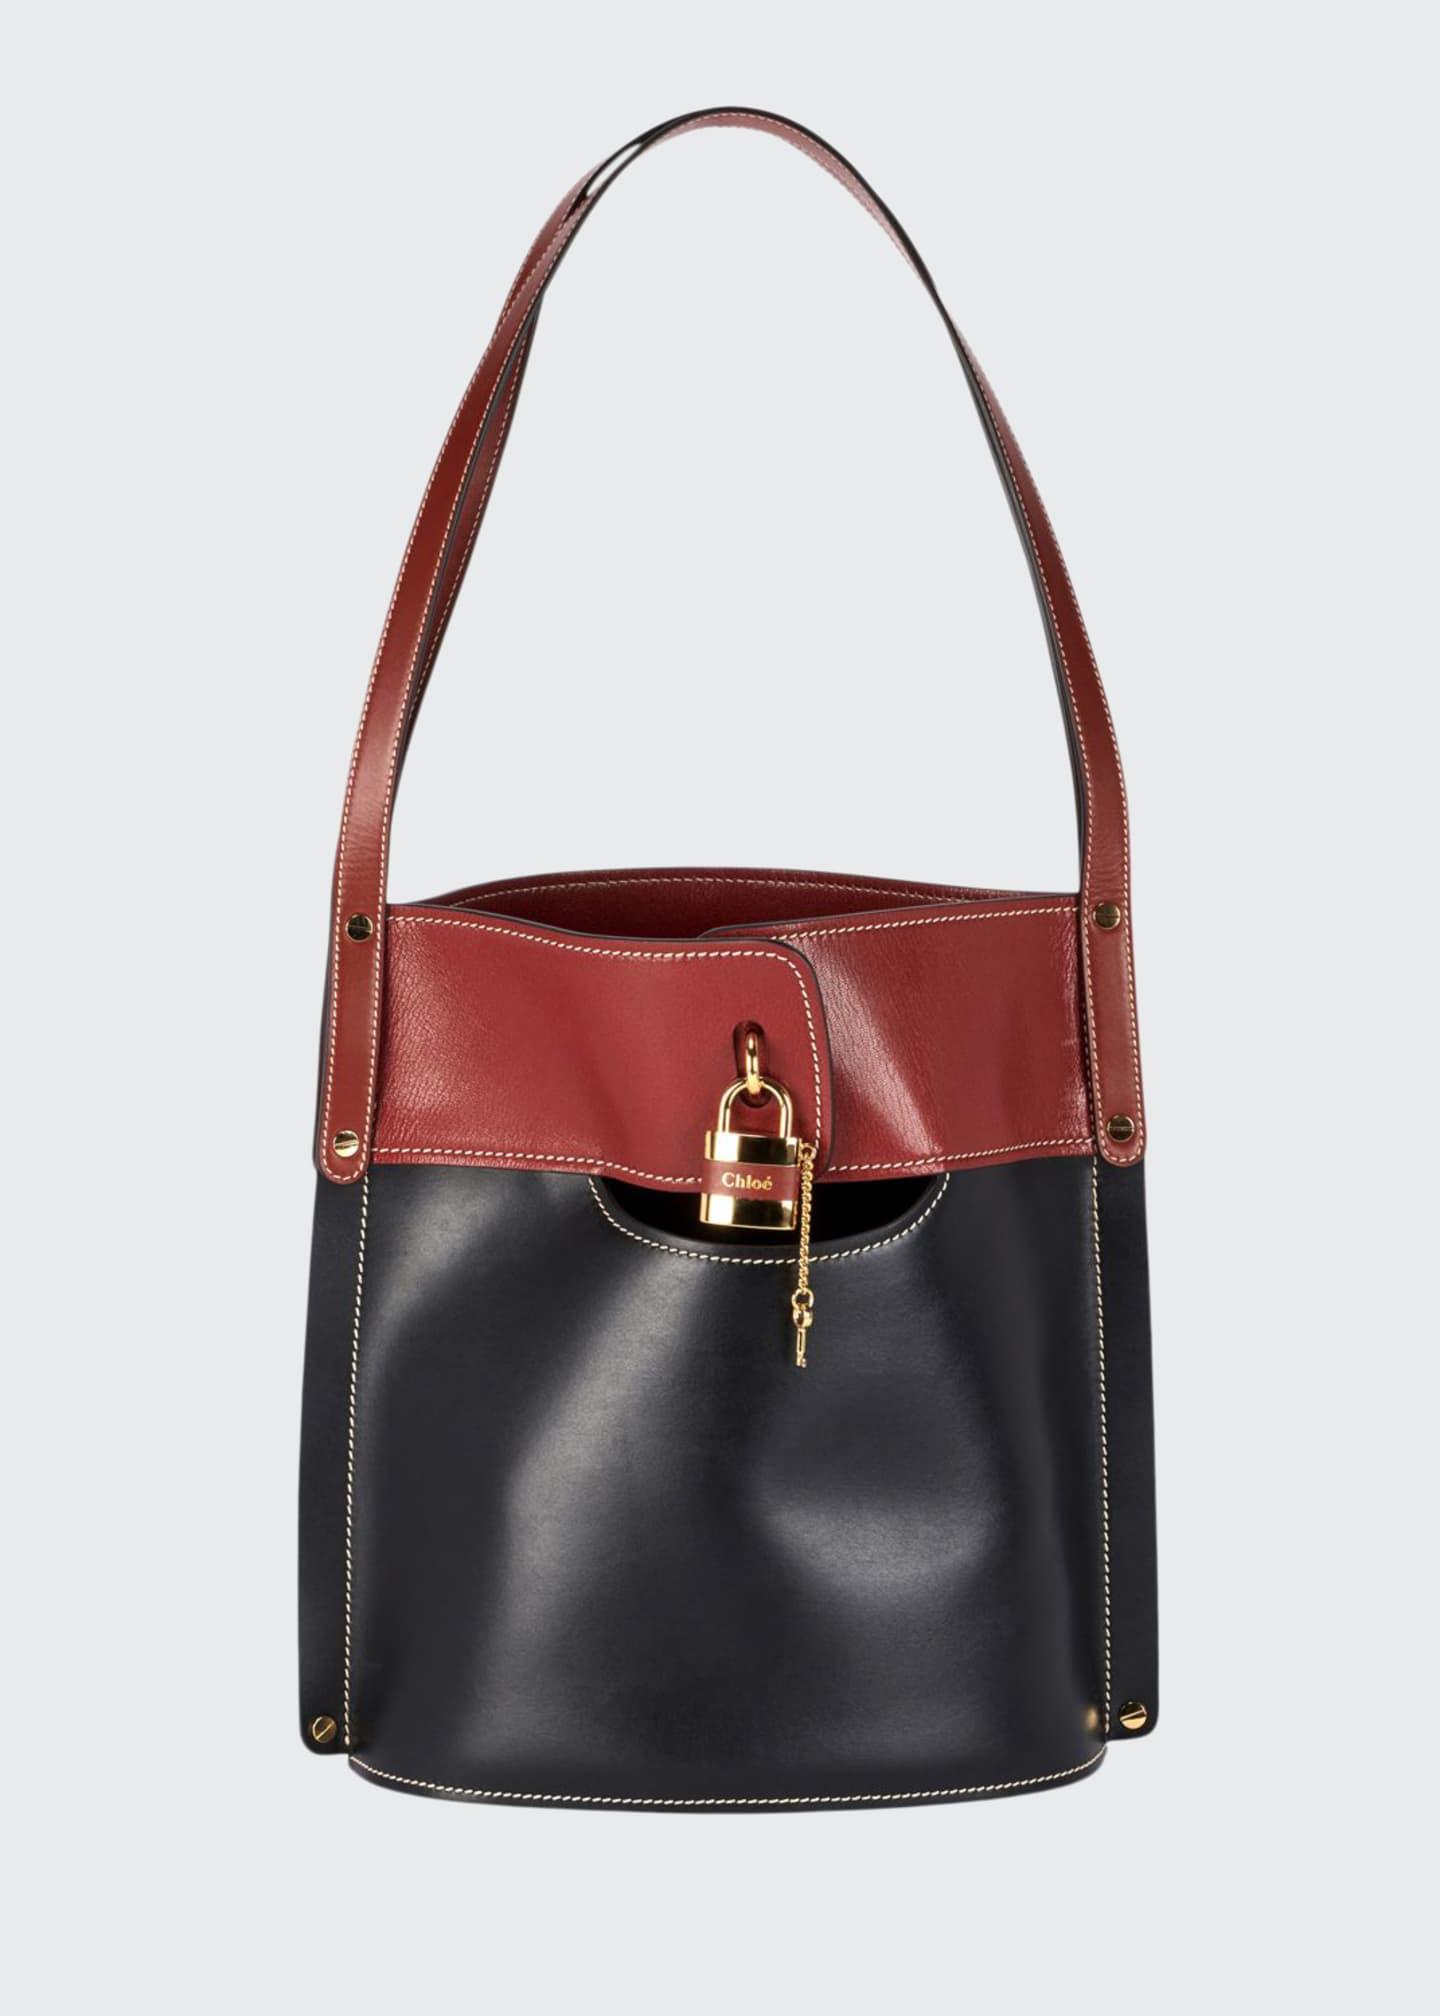 Chloe Aby Two-Tone Bucket Bag